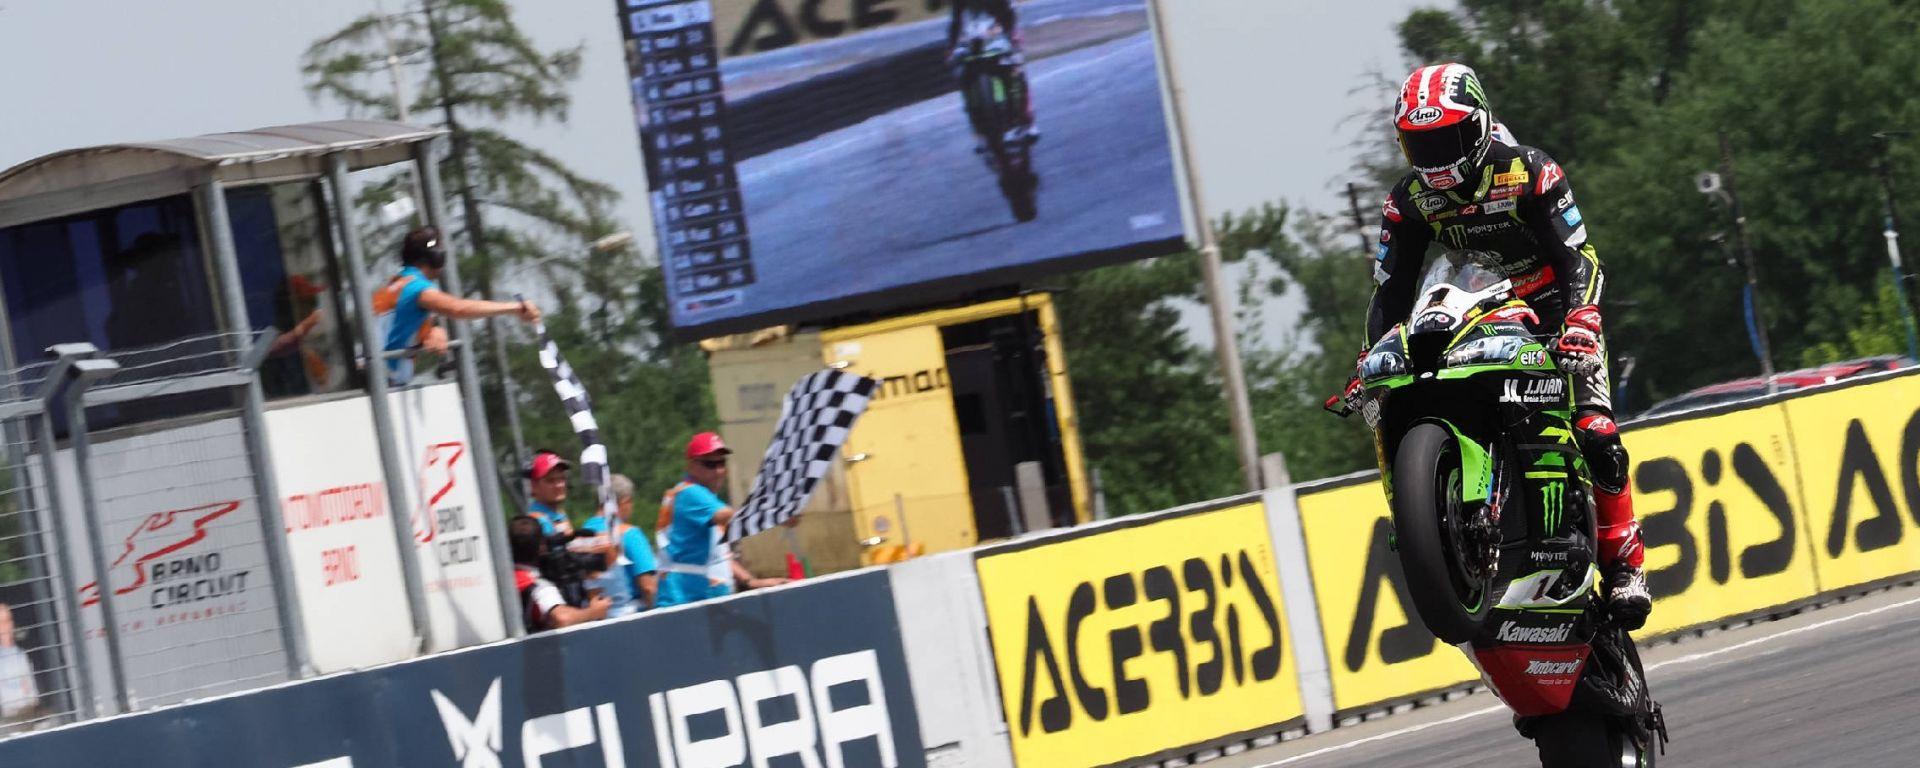 Sbk Brno 2018: Tom Sykes in pole, Rea vince gara 1